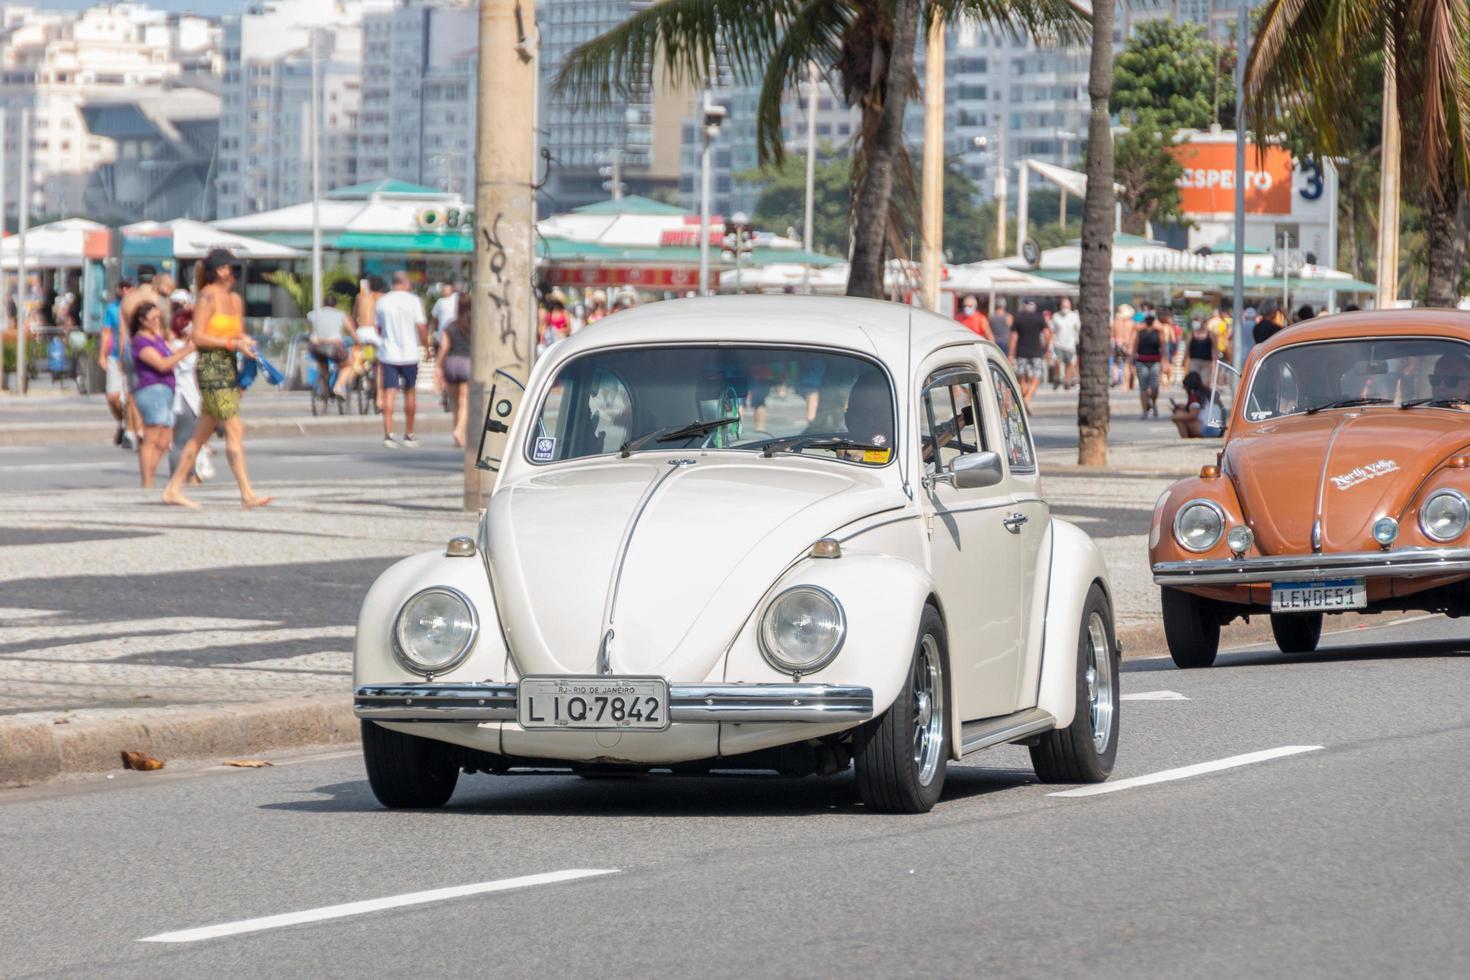 Rio de Janeiro, Brasilien, 2021 - skalbaggar på Copacabana -stranden foto